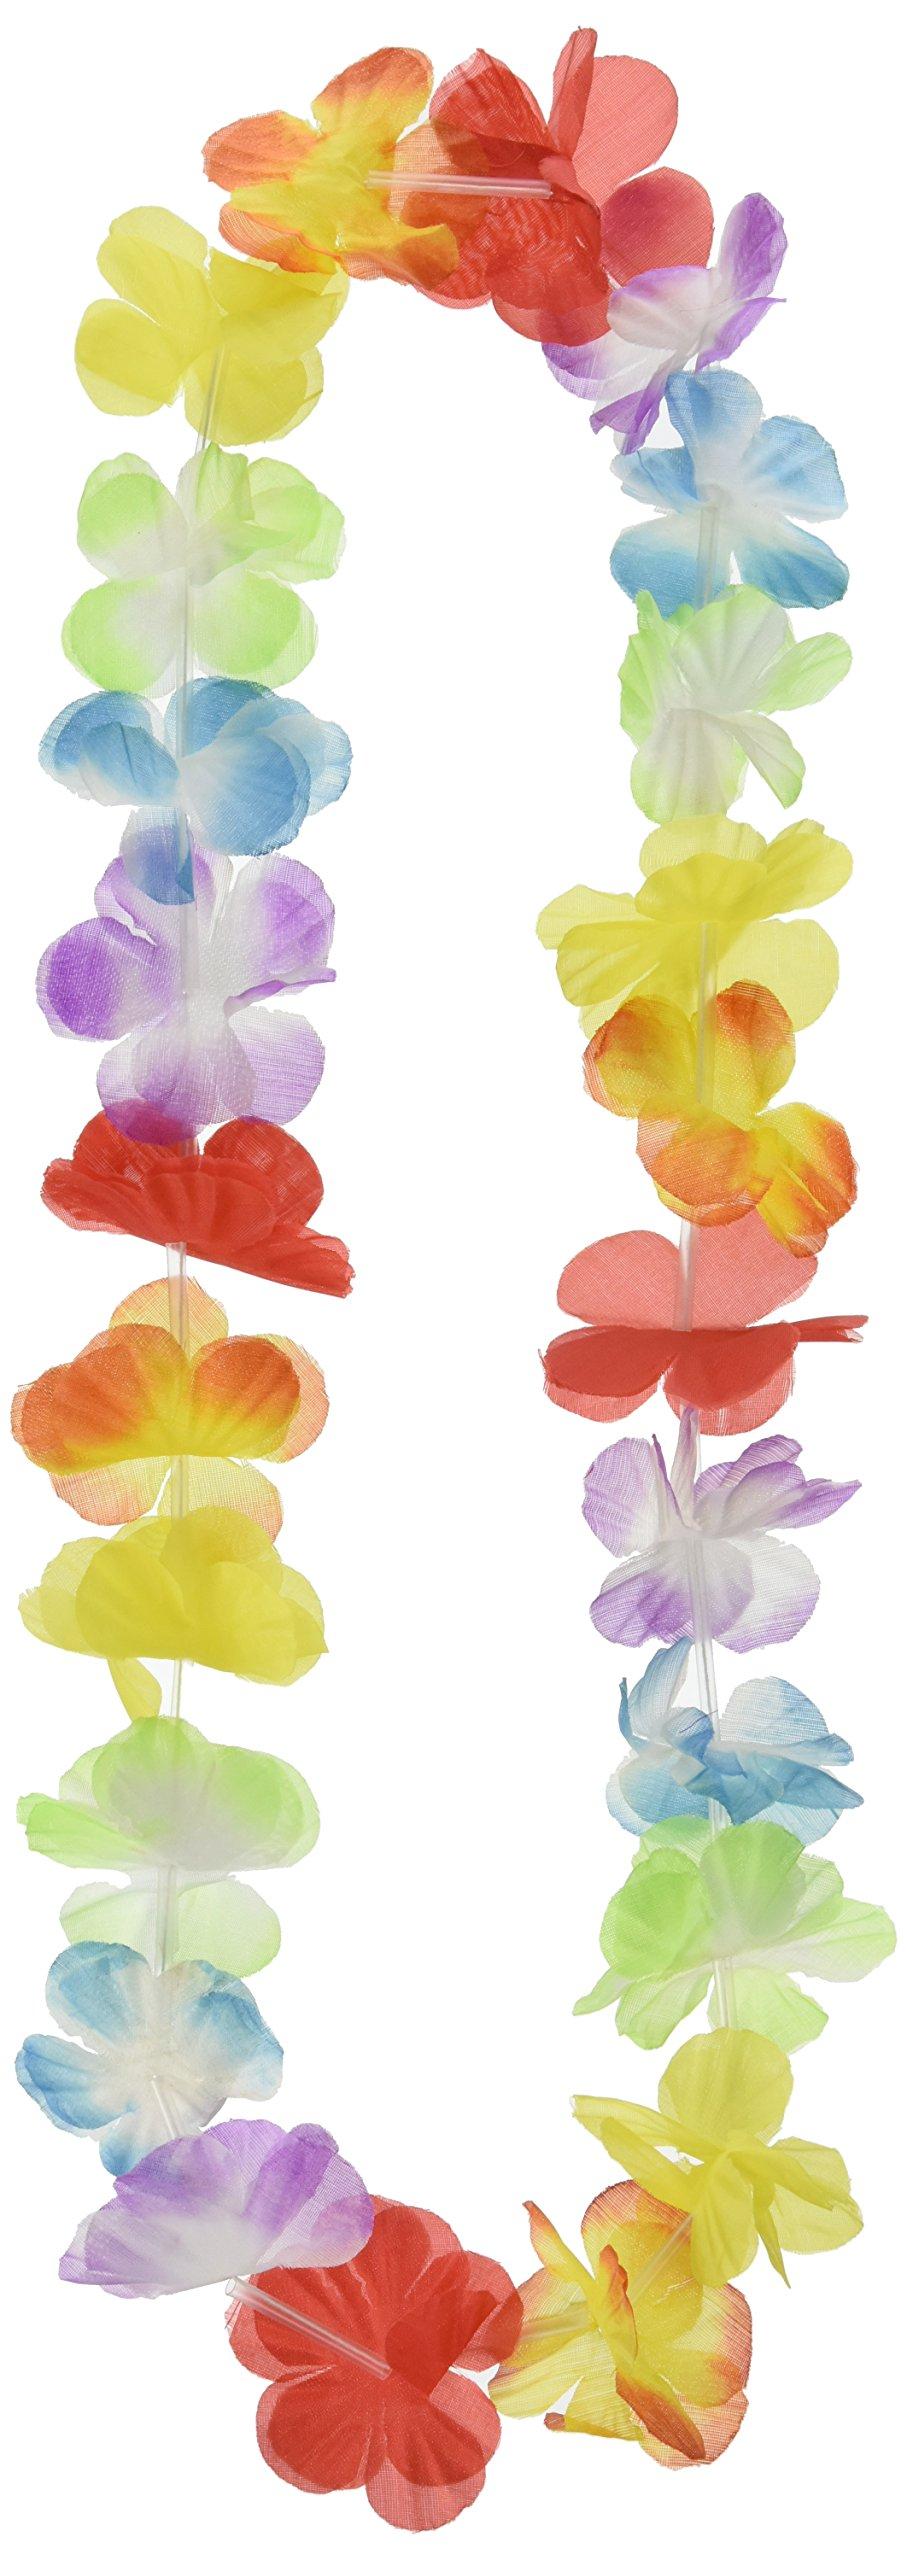 Fun Express Mega Silk Lei Flower Assortment for Tropical Hawaiian Luau Party Favors (50 Count)